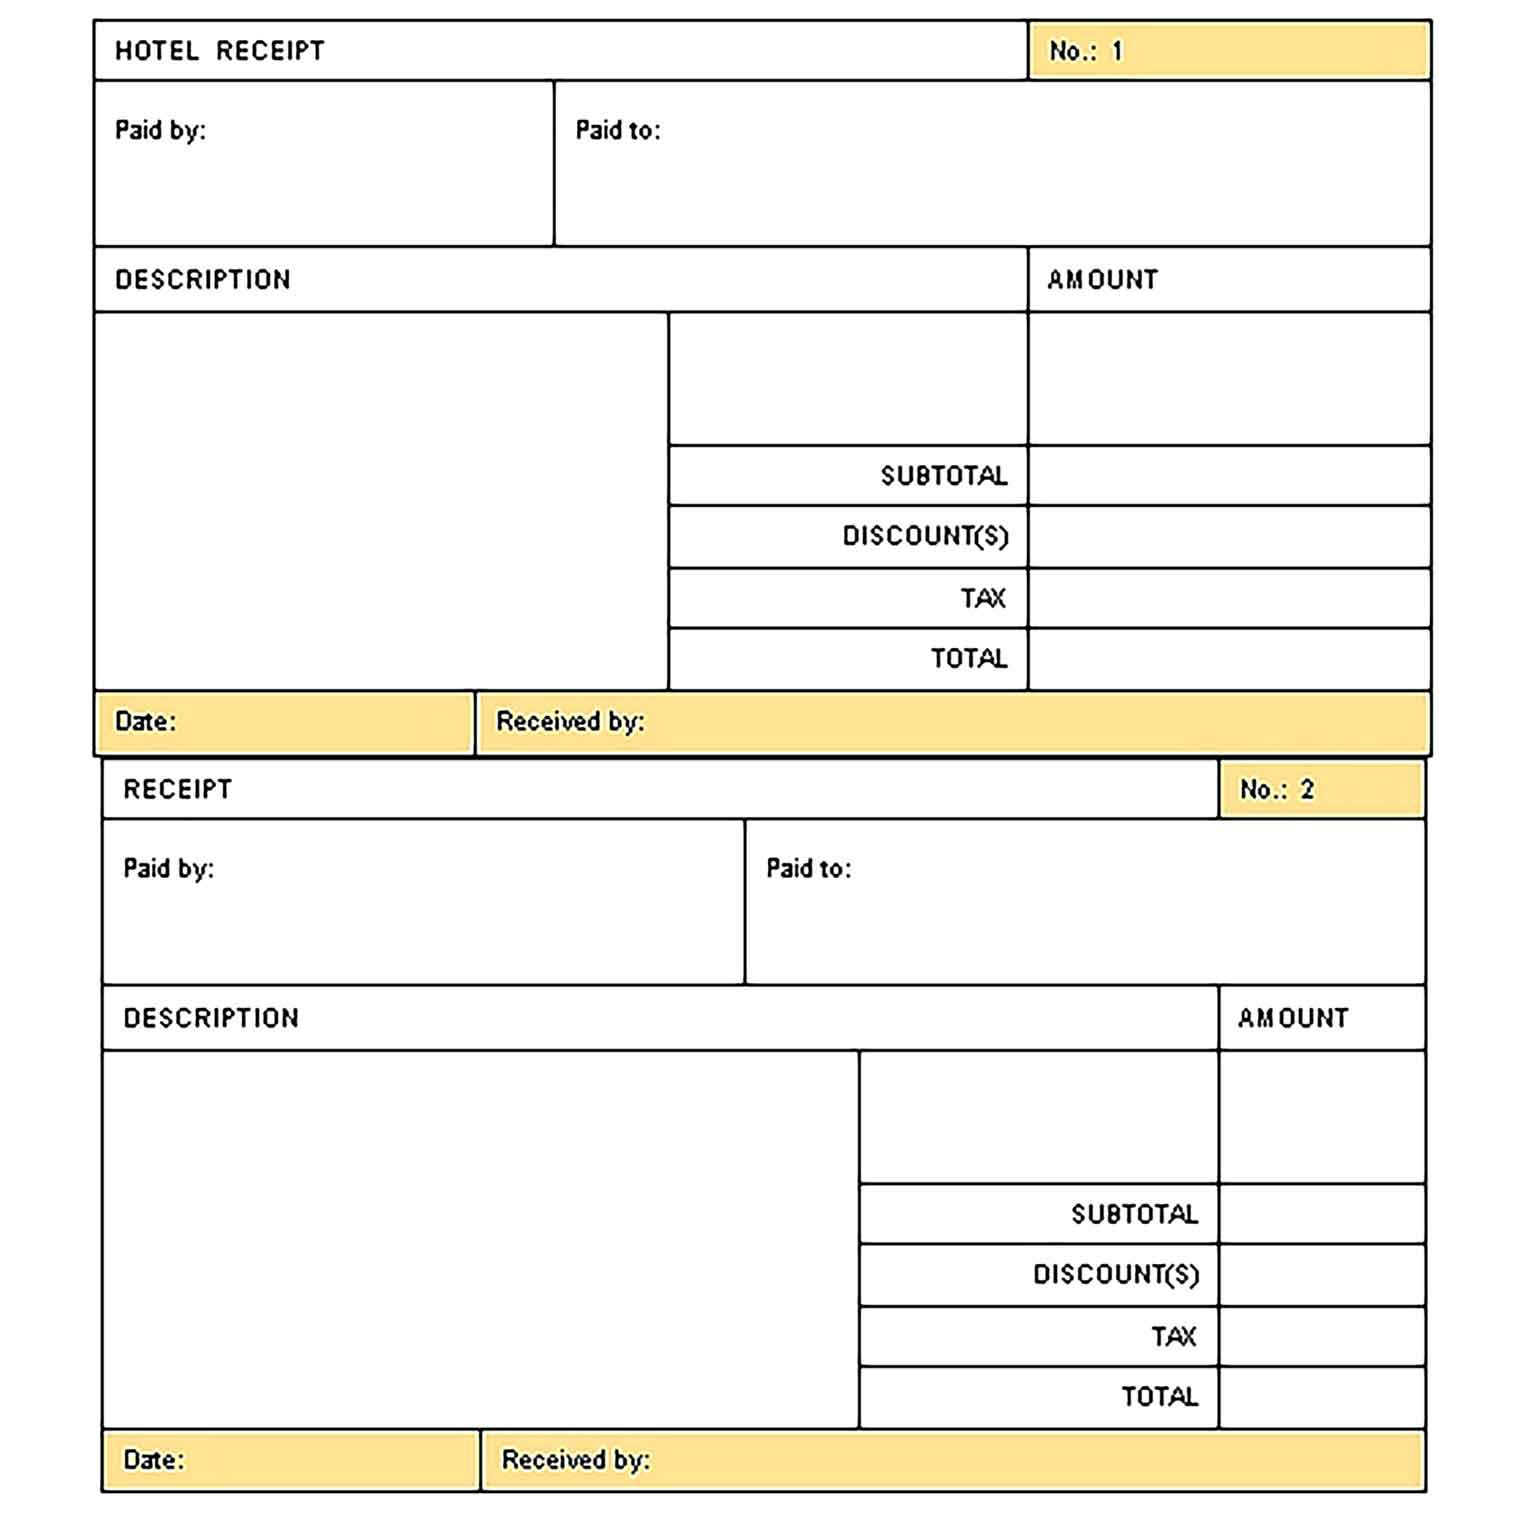 Sample Hotel Invoice Template Invoice Template Invoice Template Word Invoice Design